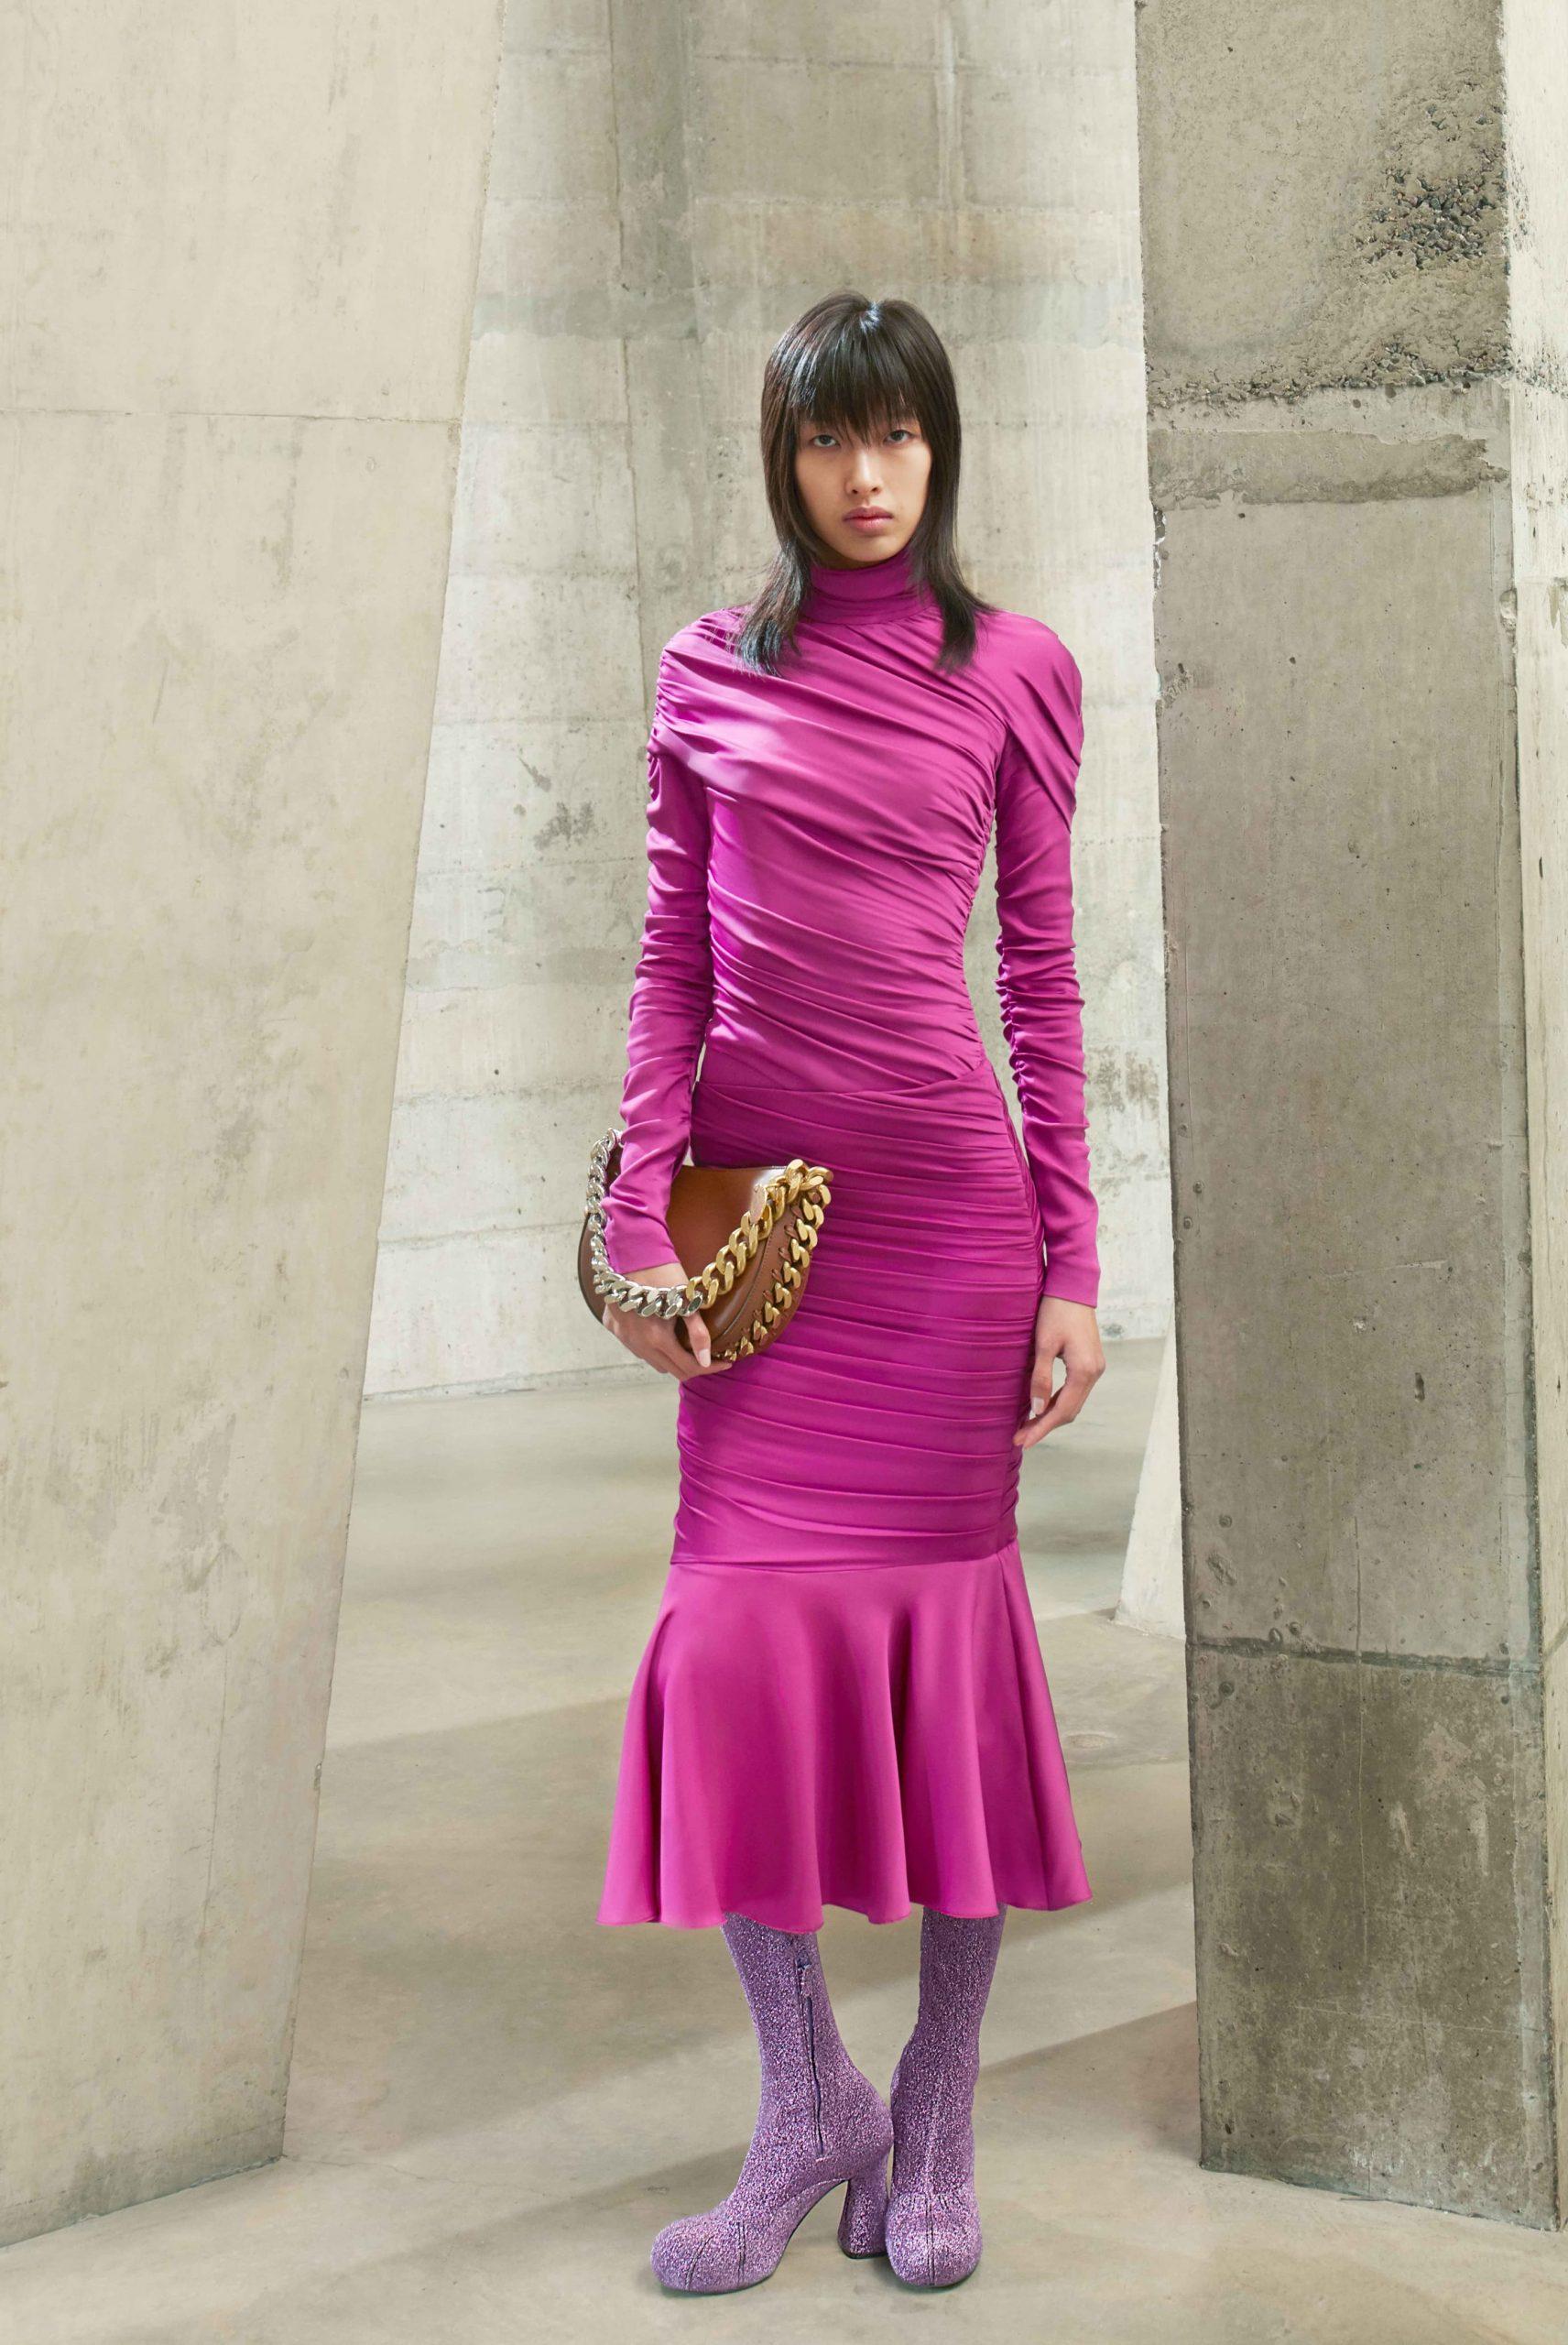 Stella McCartney Fall 2021 Fashion Show Review